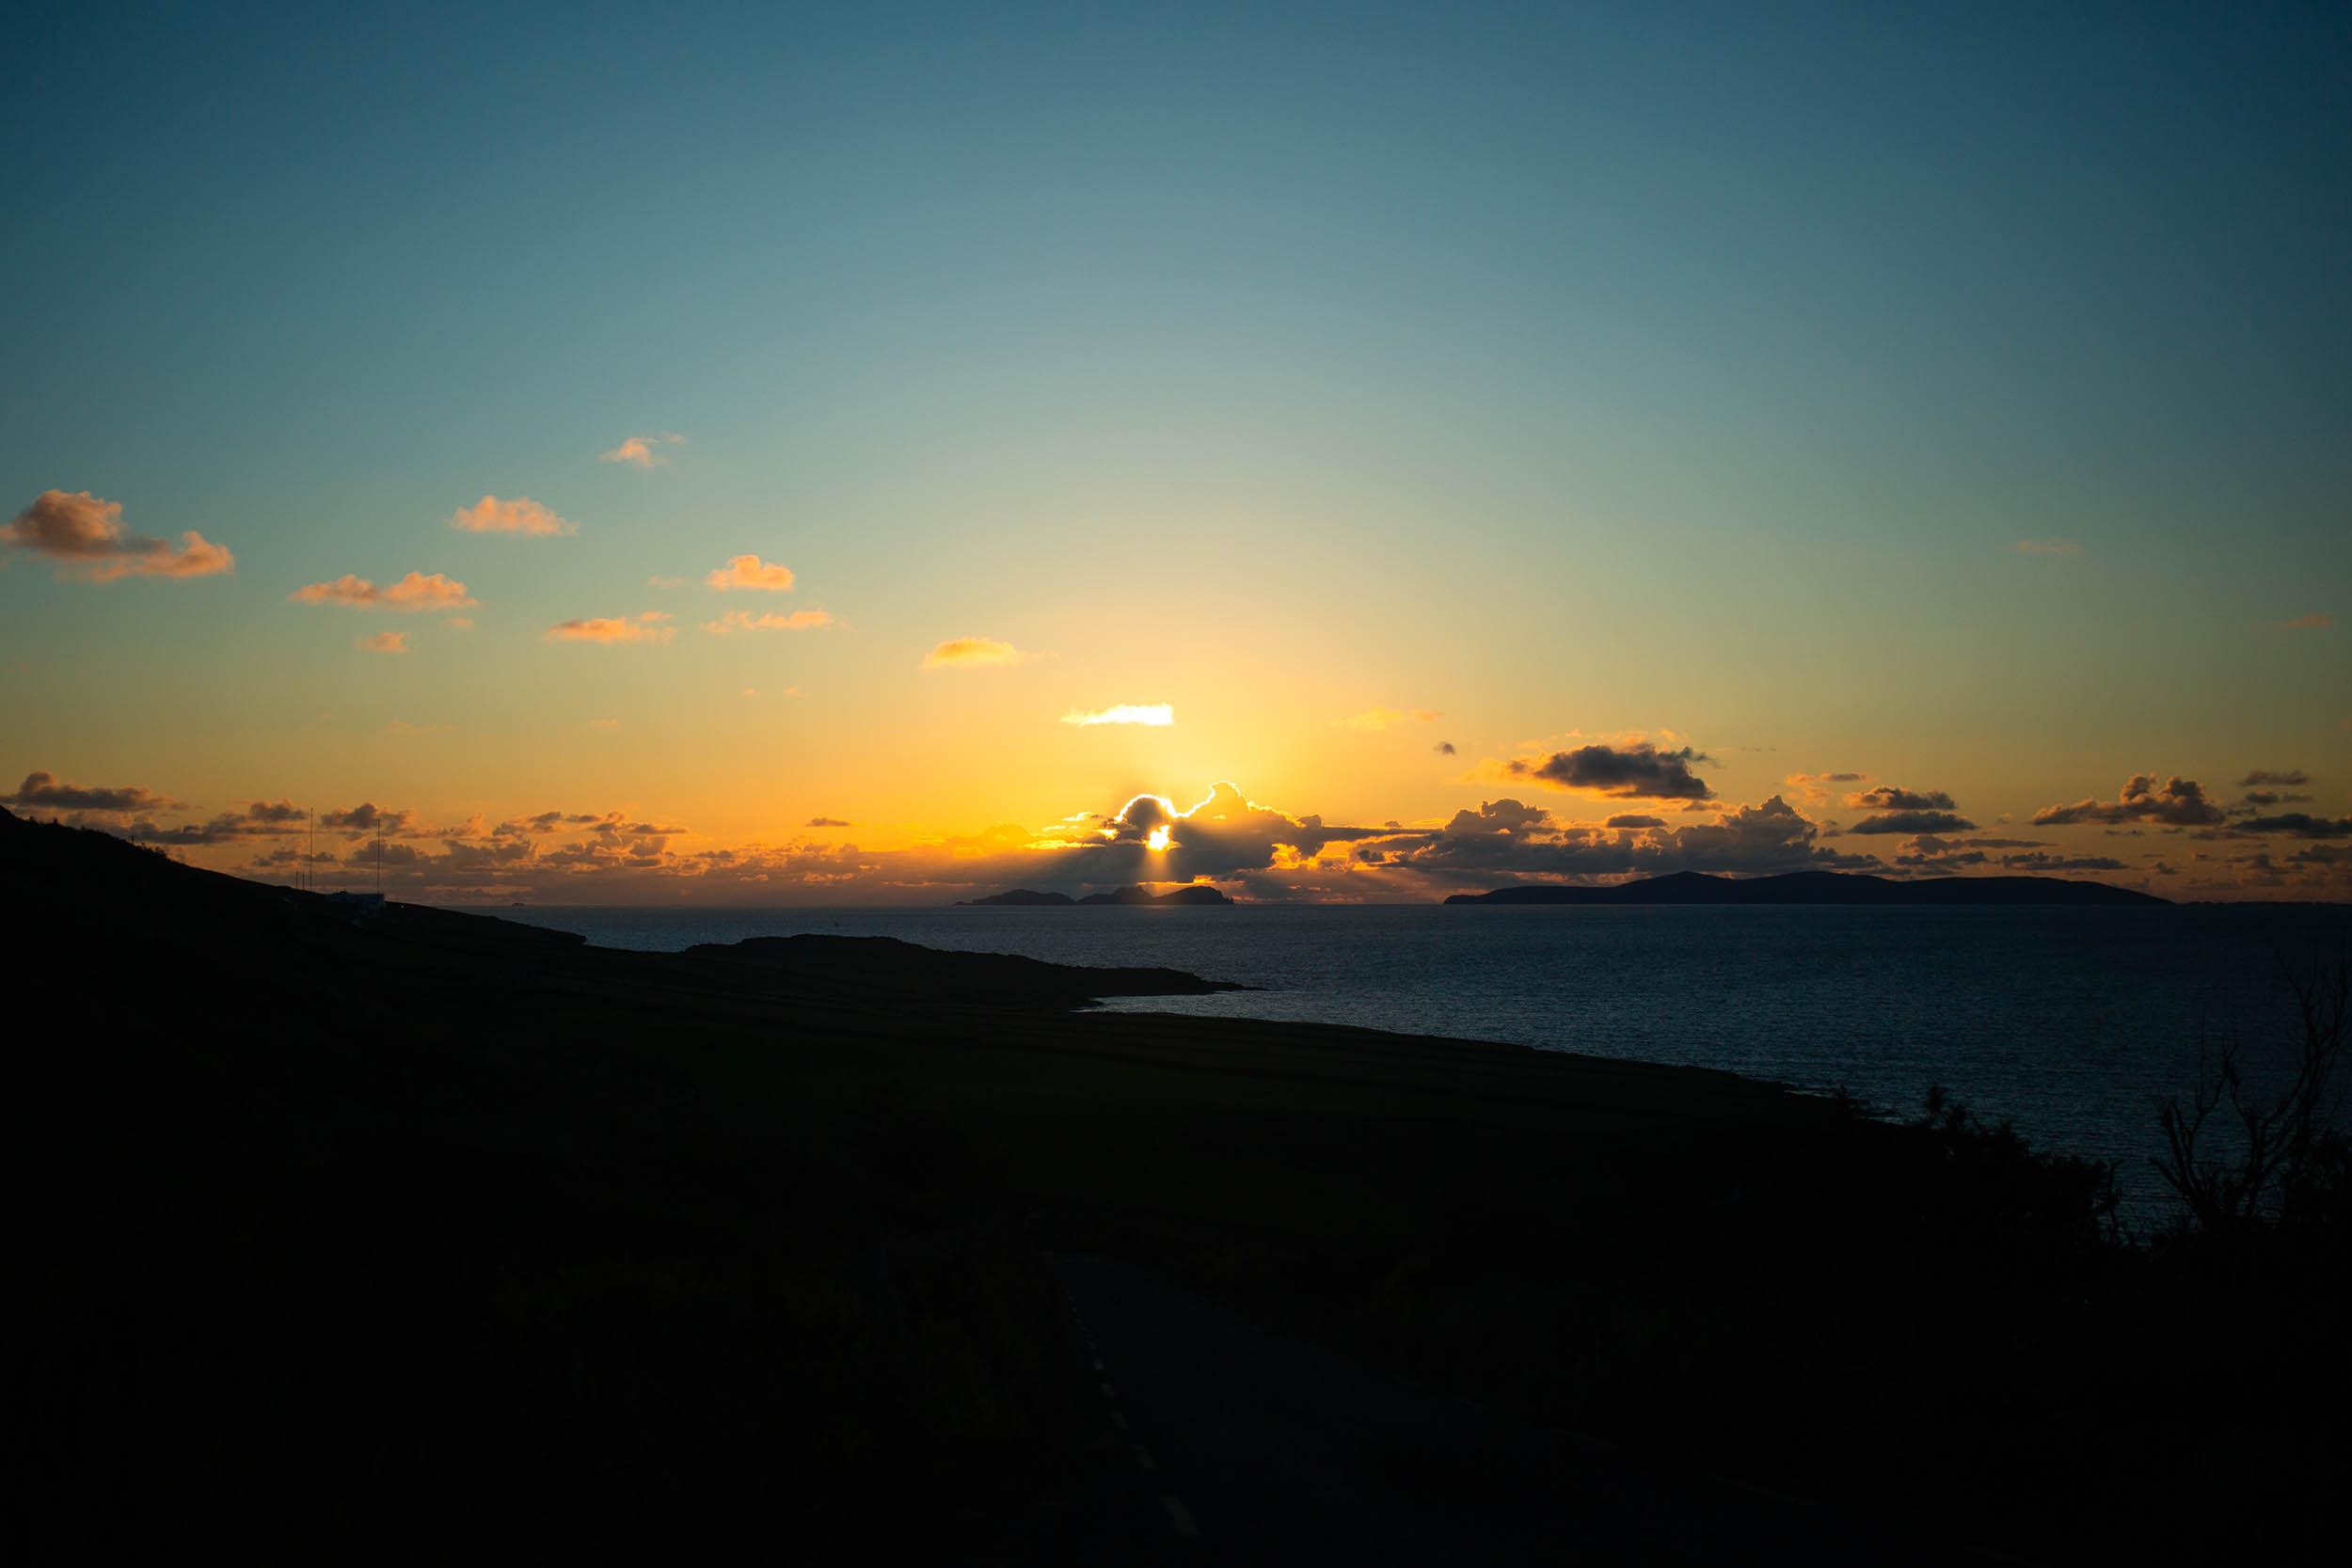 IRELAND_KERRY_VALENTIAISLAND_0017